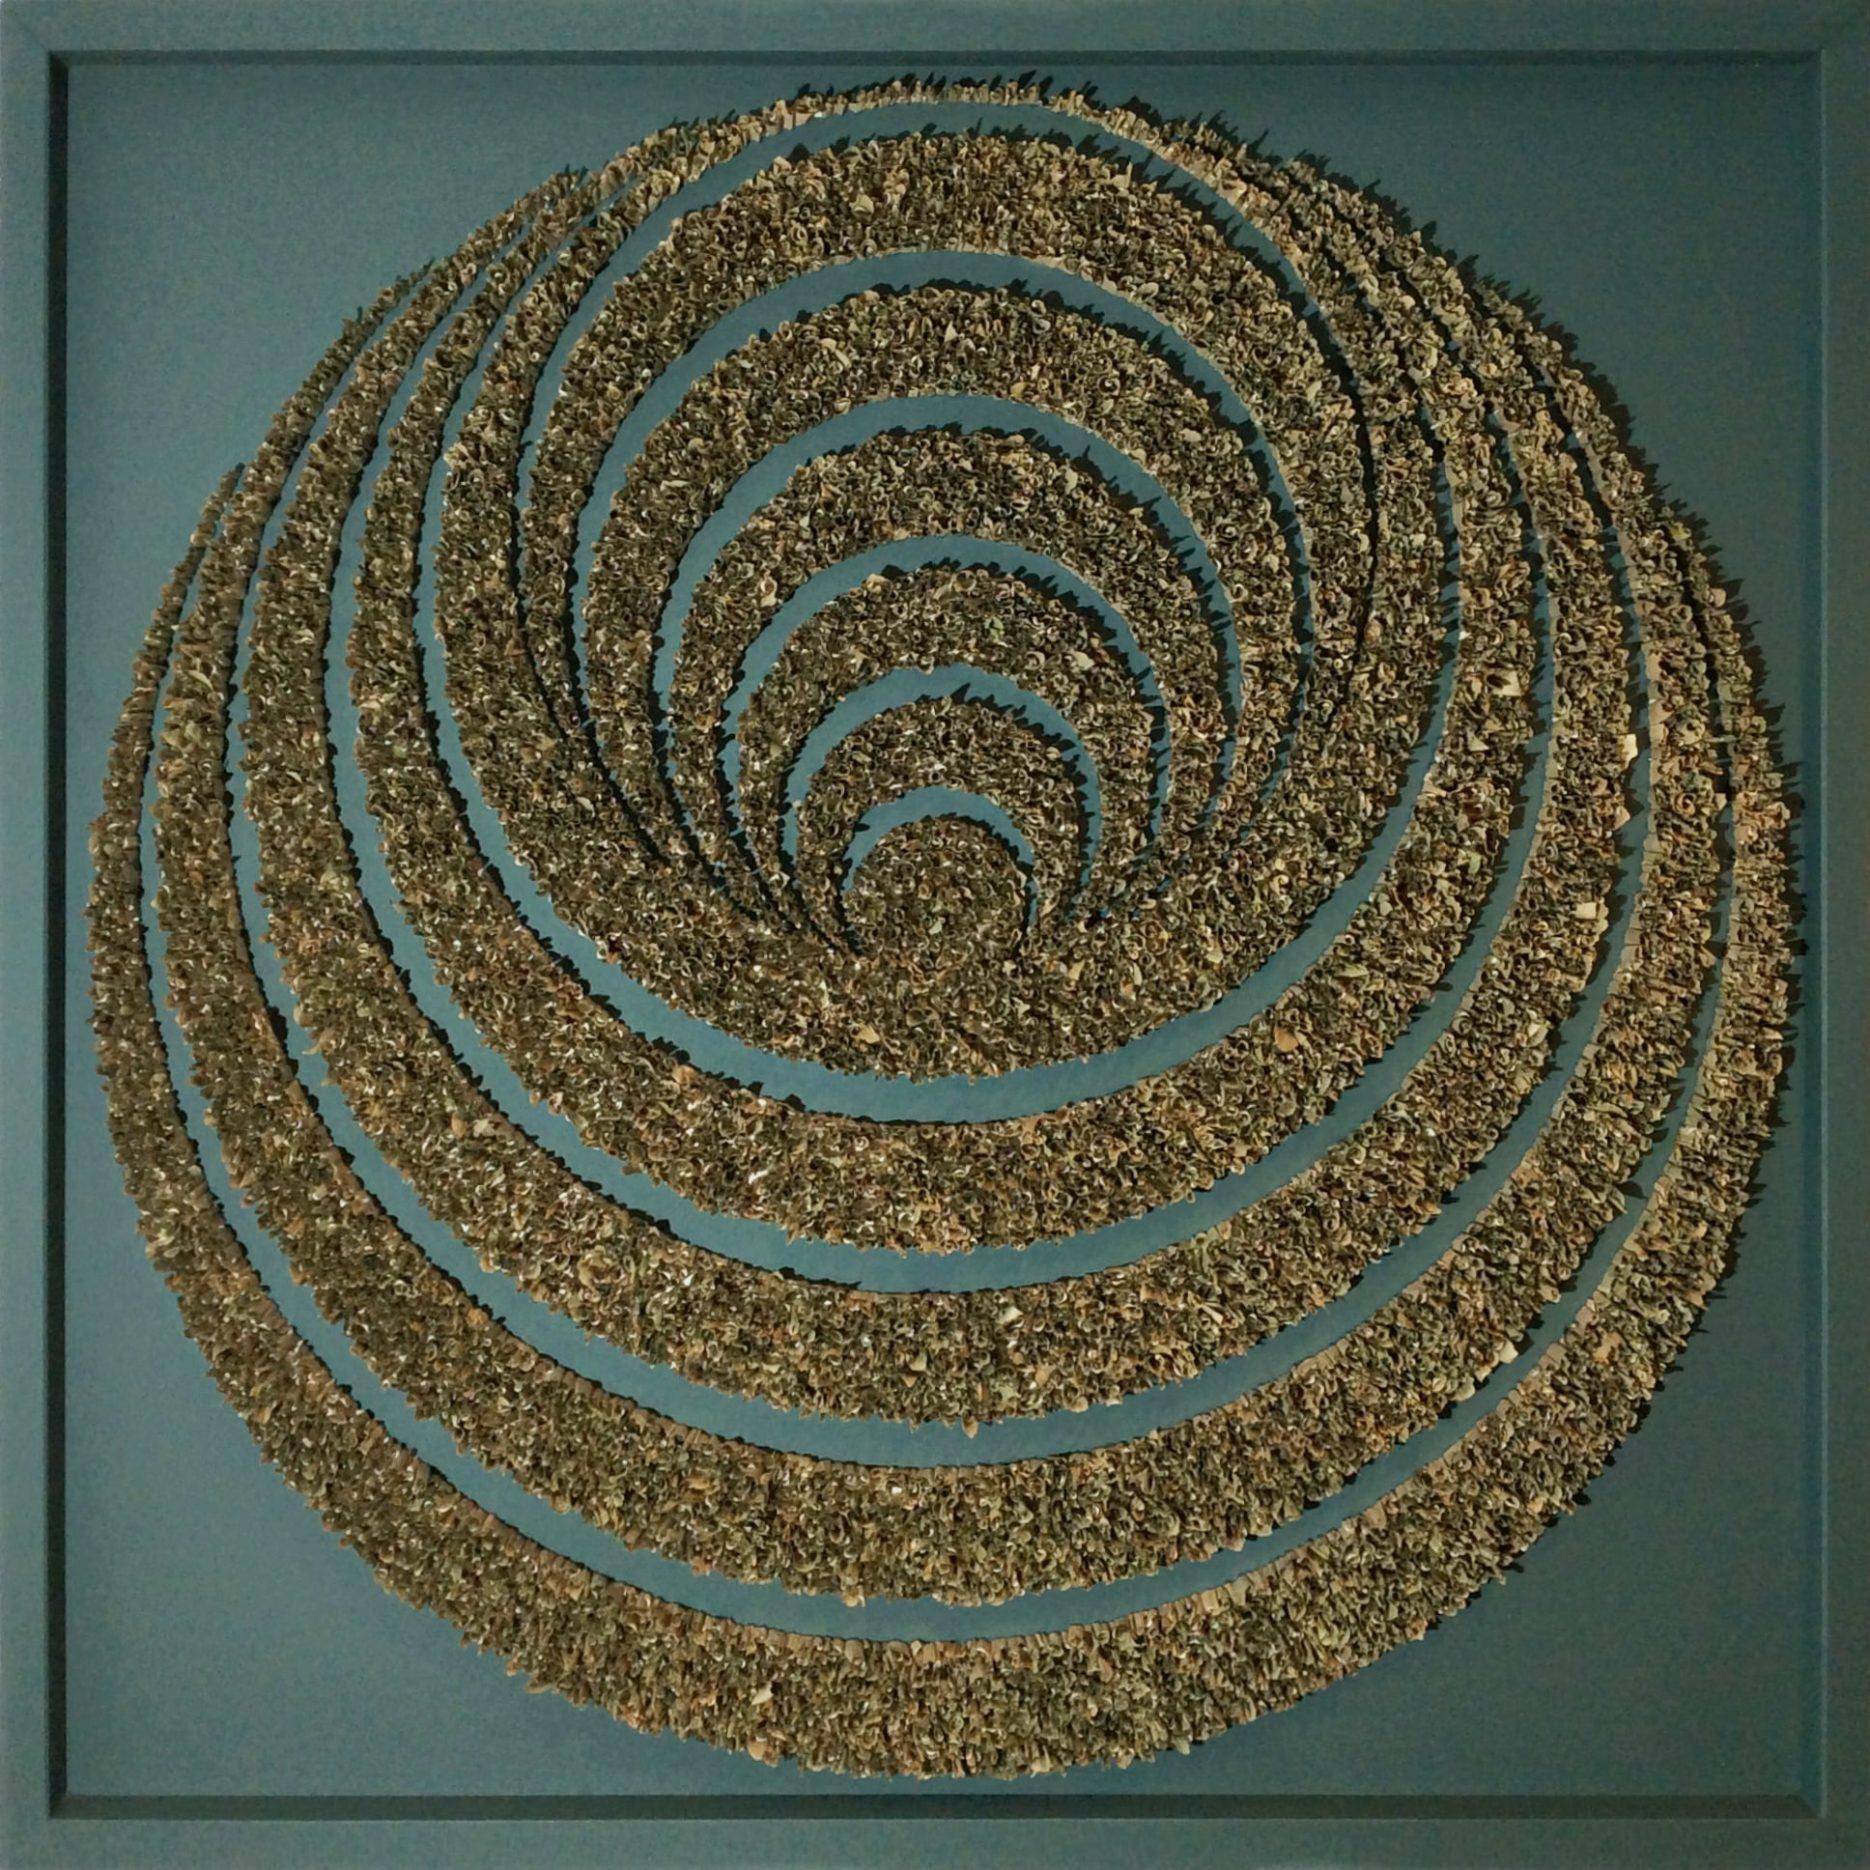 Bild 1,20 x 1,20m – Maisblattelemente gerollt (2020)